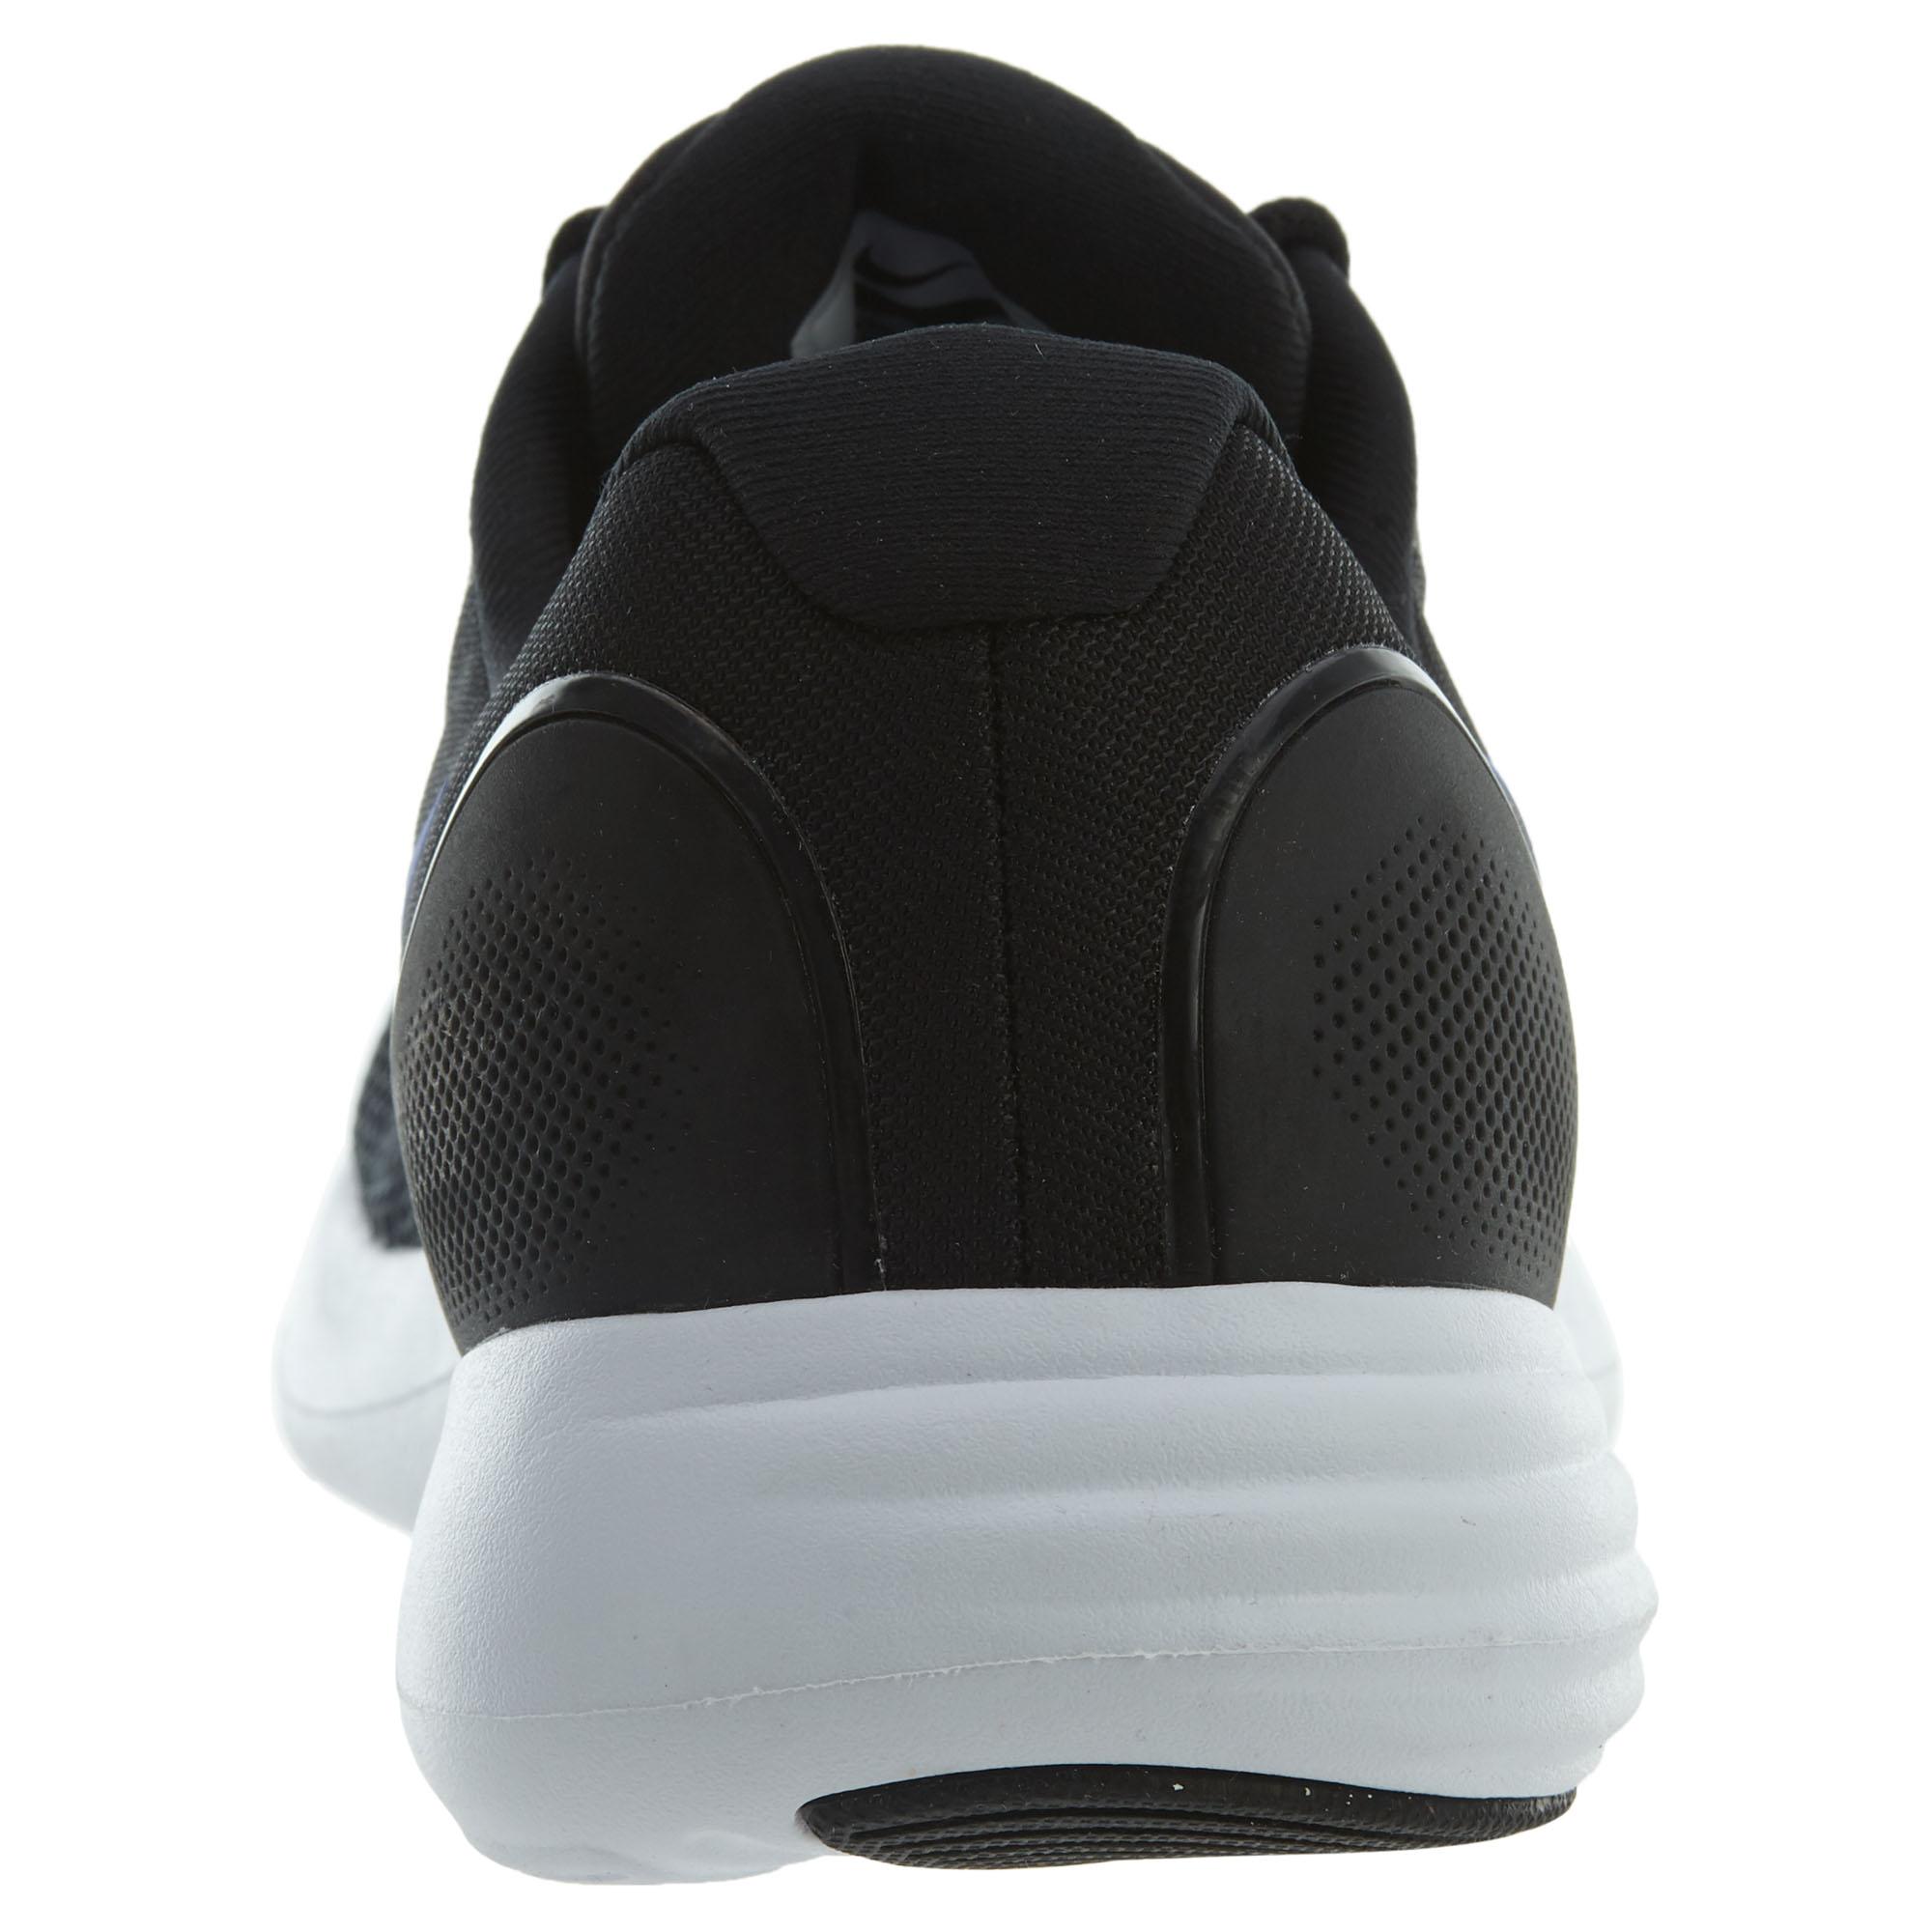 Nike Lunar Apparent Mens Style : 908987